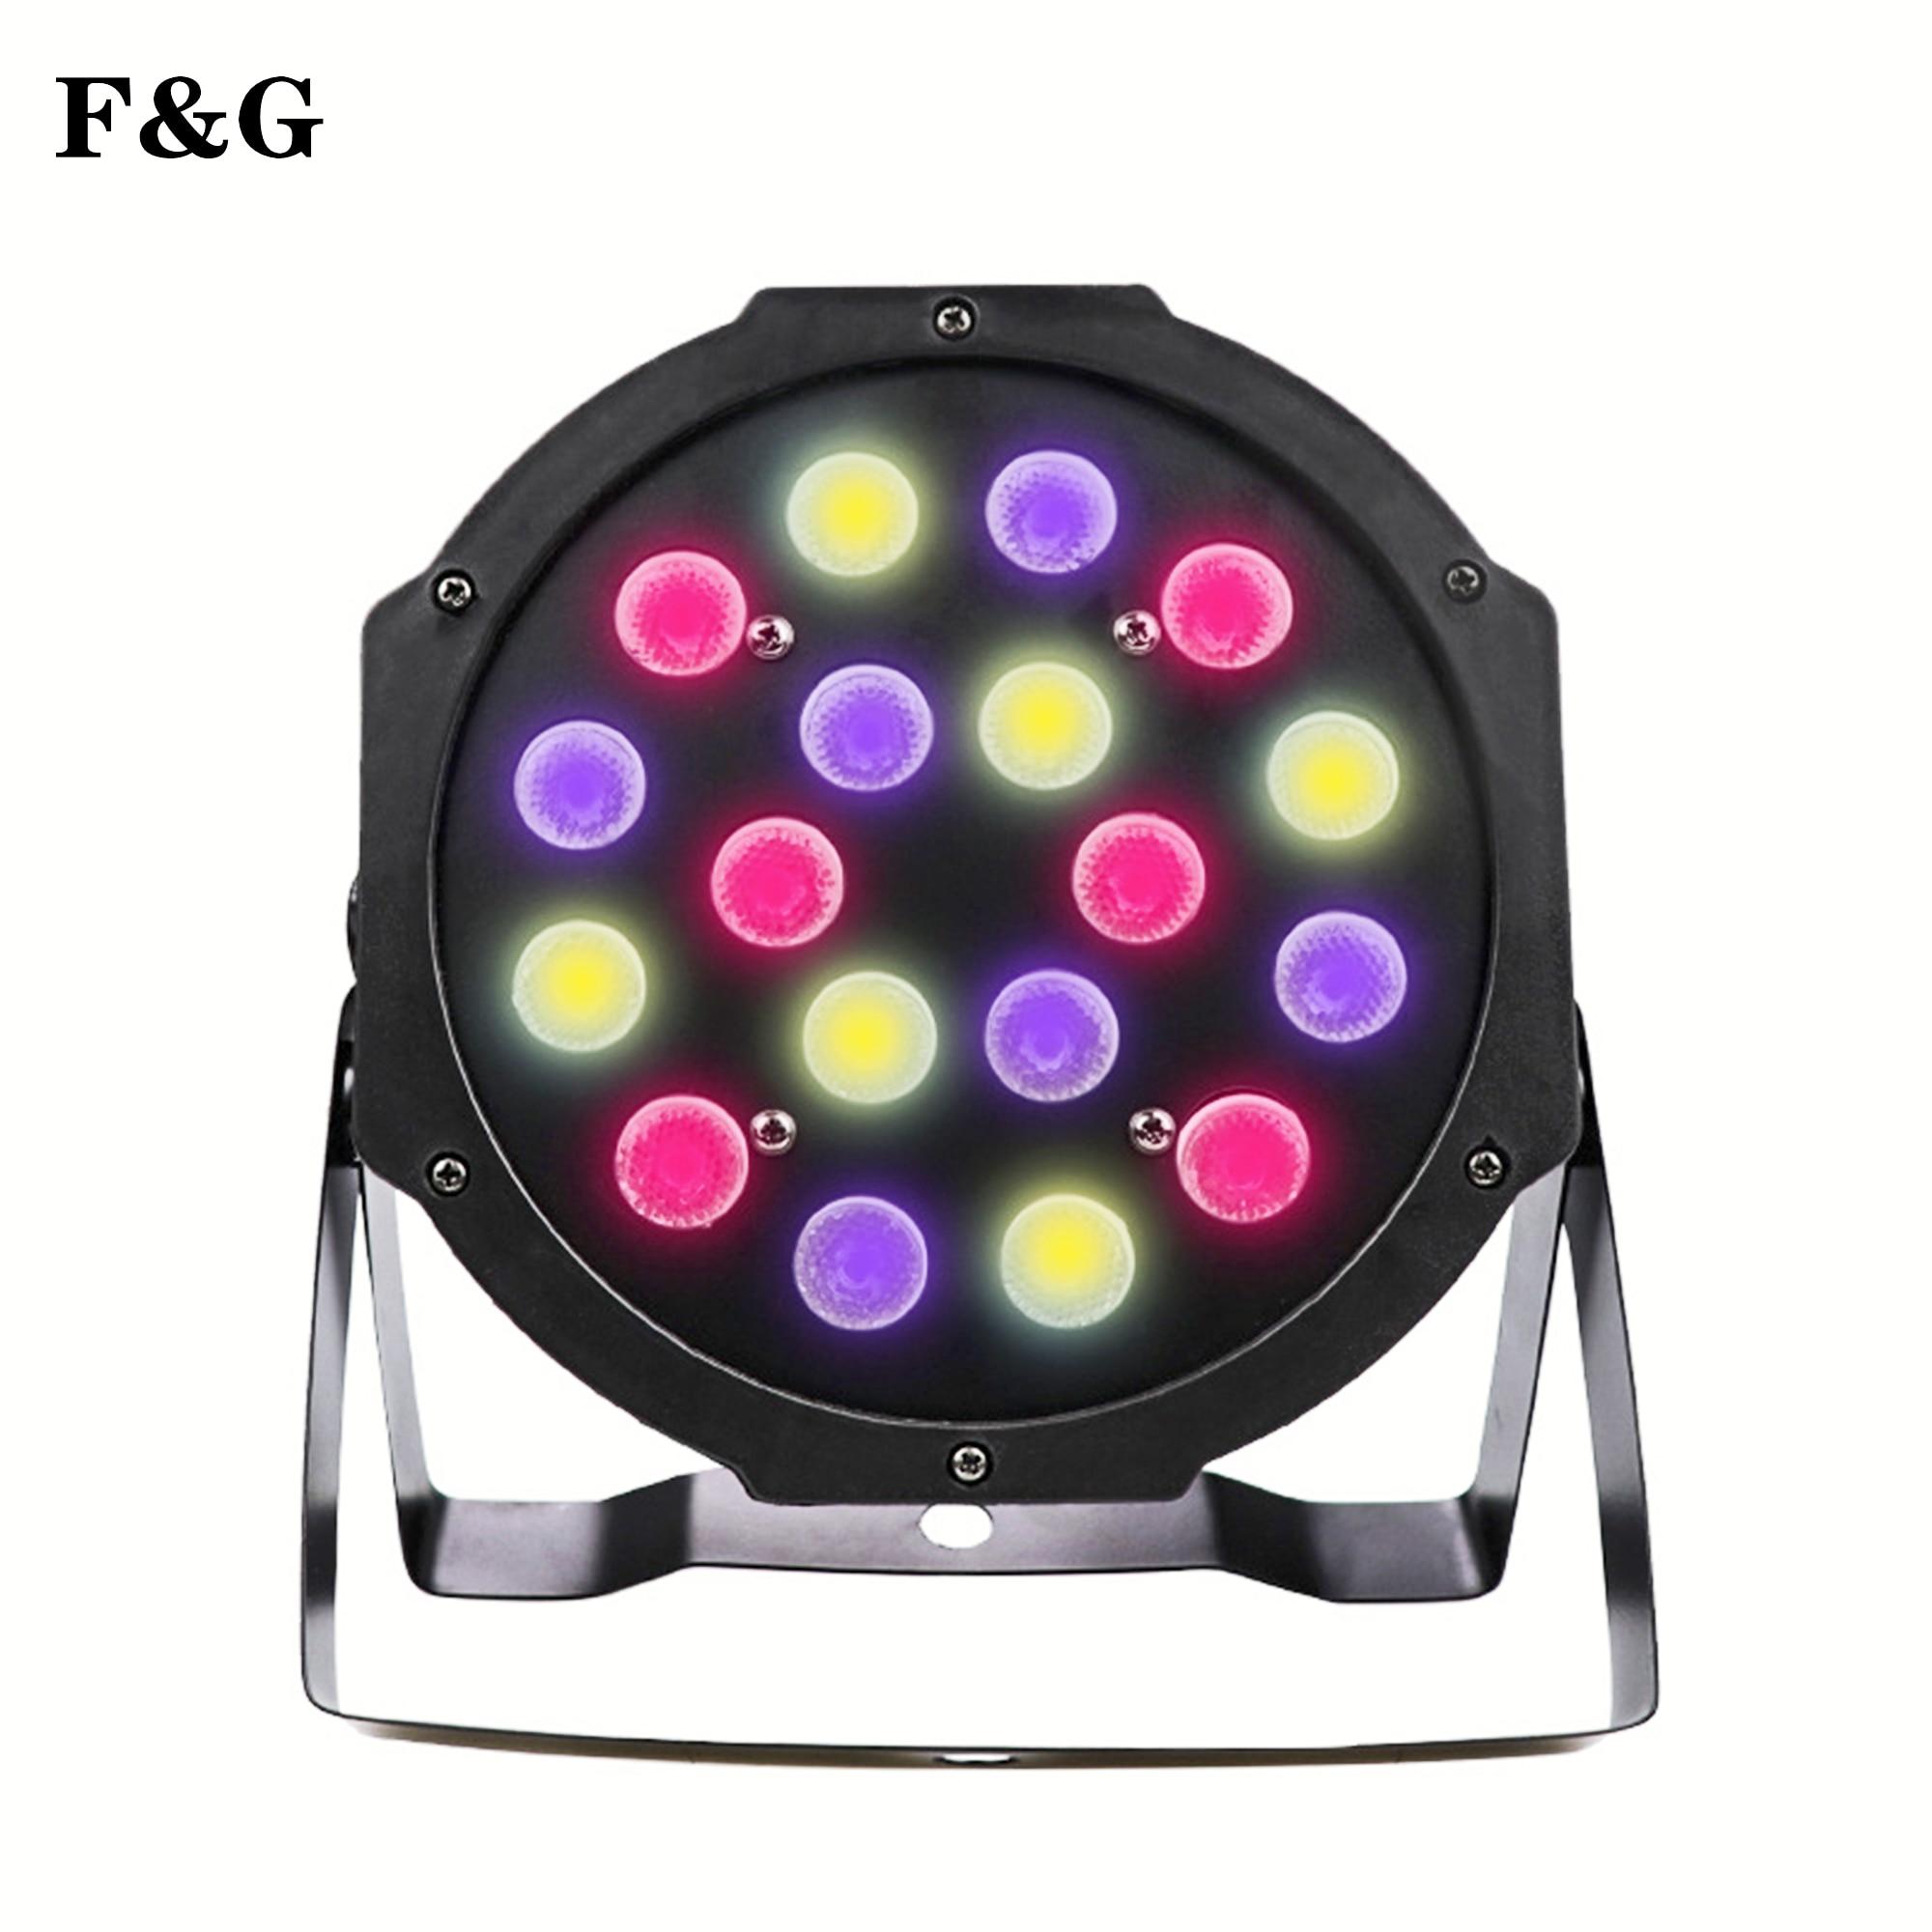 Luz LED RGB para escenario, bola mágica de cristal, DMX, 110-240V, para discotecas, clubs y fiestas, 18